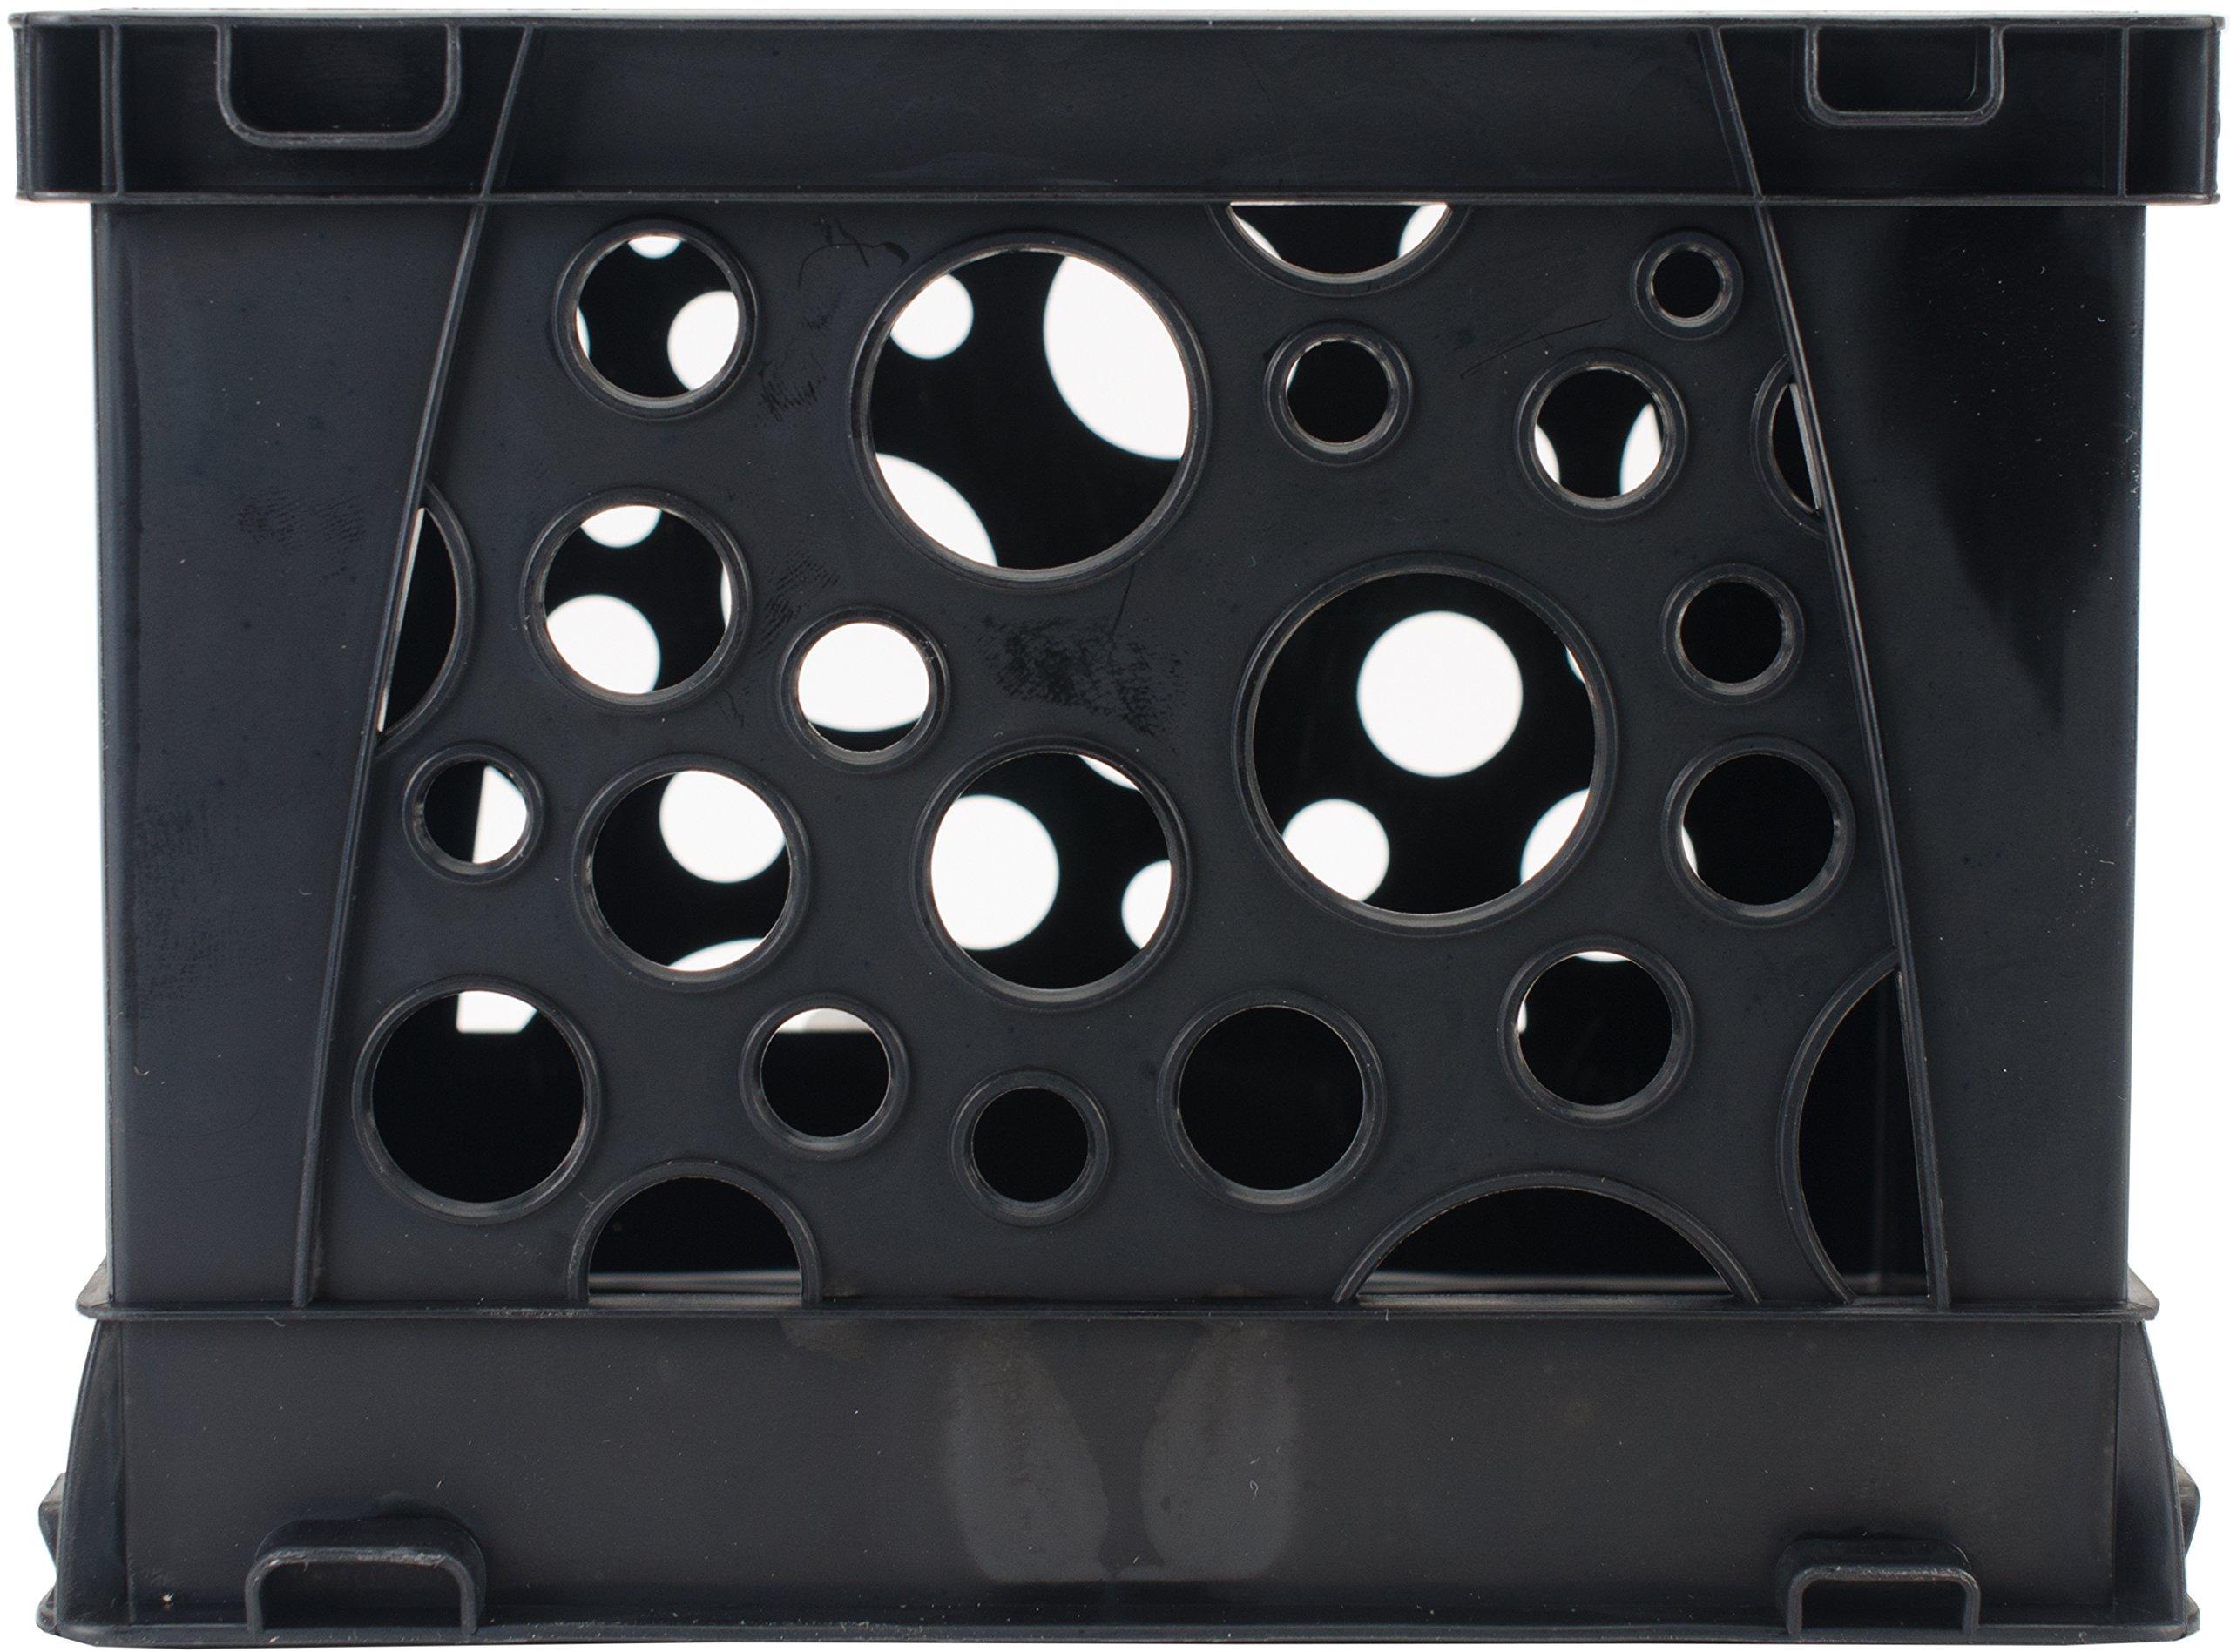 Storex Micro Crate, Black